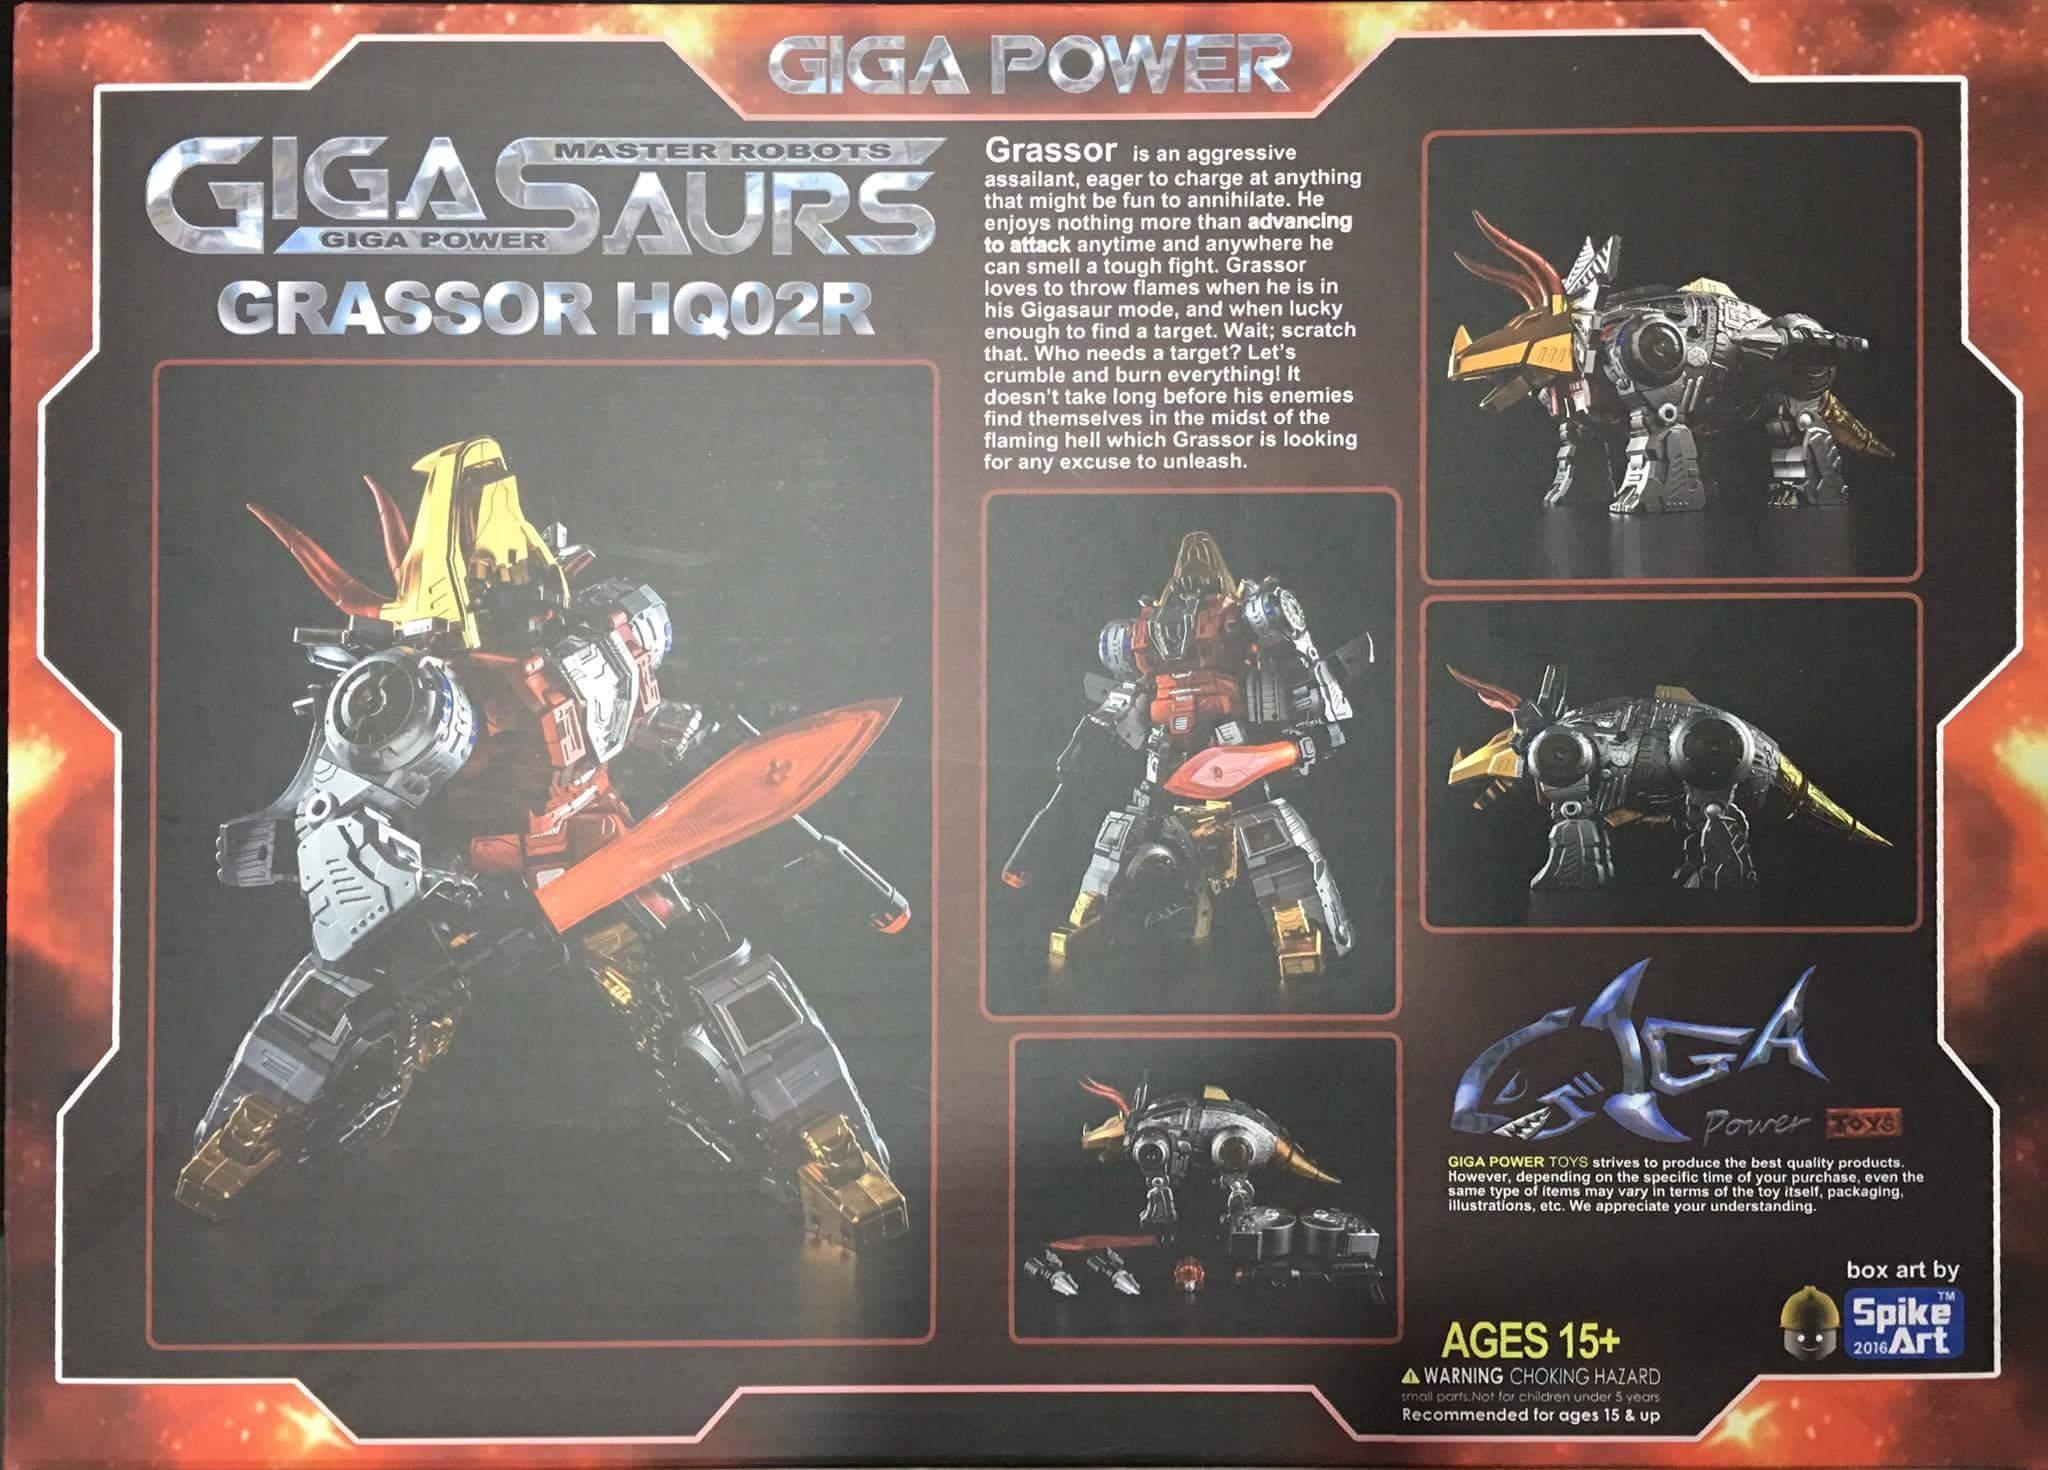 [GigaPower] Produit Tiers - Jouets HQ-01 Superator + HQ-02 Grassor + HQ-03 Guttur + HQ-04 Graviter + HQ-05 Gaudenter - aka Dinobots - Page 4 SxxKRvNI